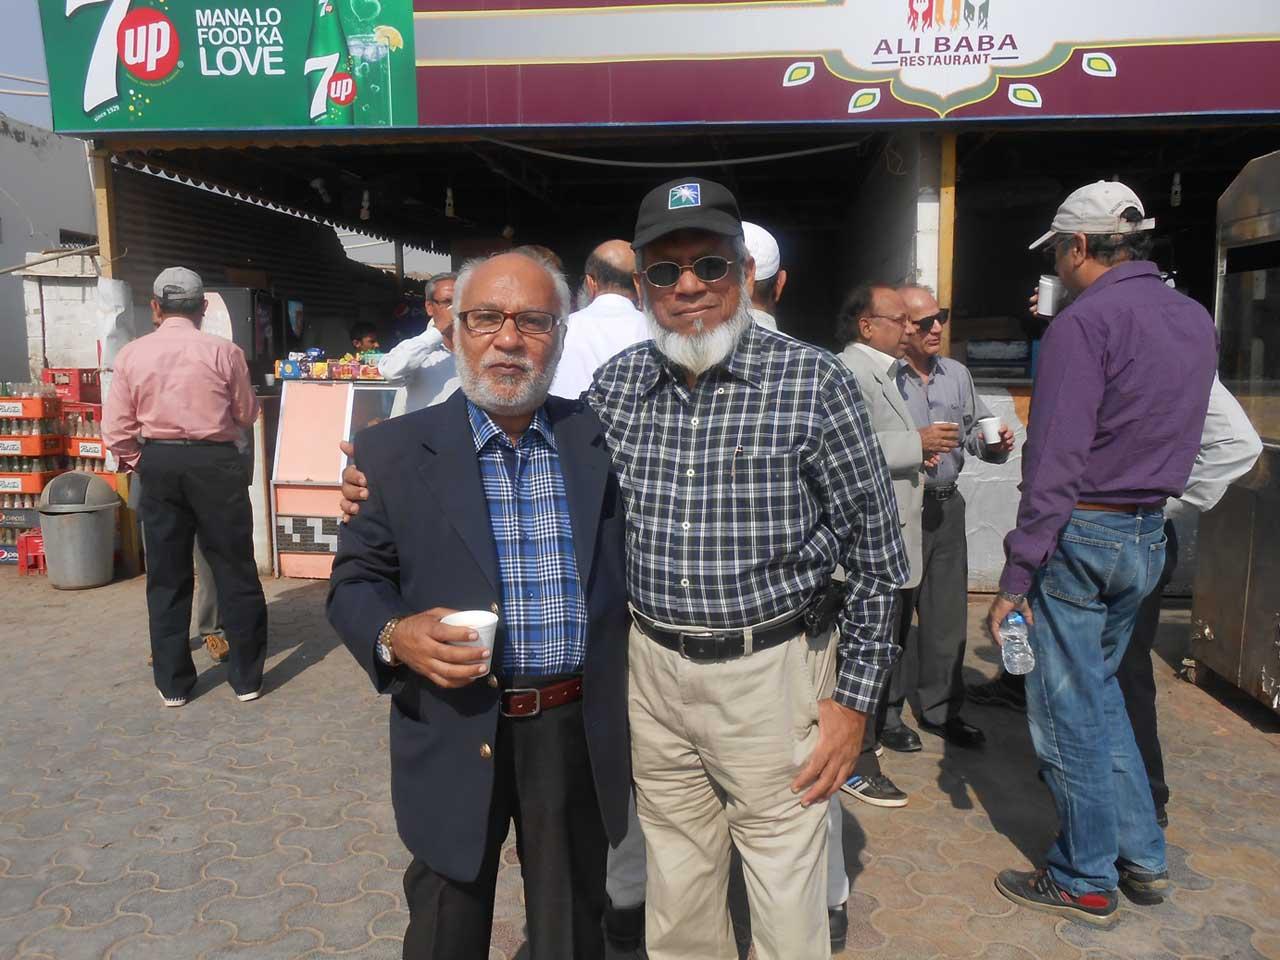 Engr. Gulzar Memon and Engr. Iqbal Ahmed Khan @ Ali Baba CNG Station